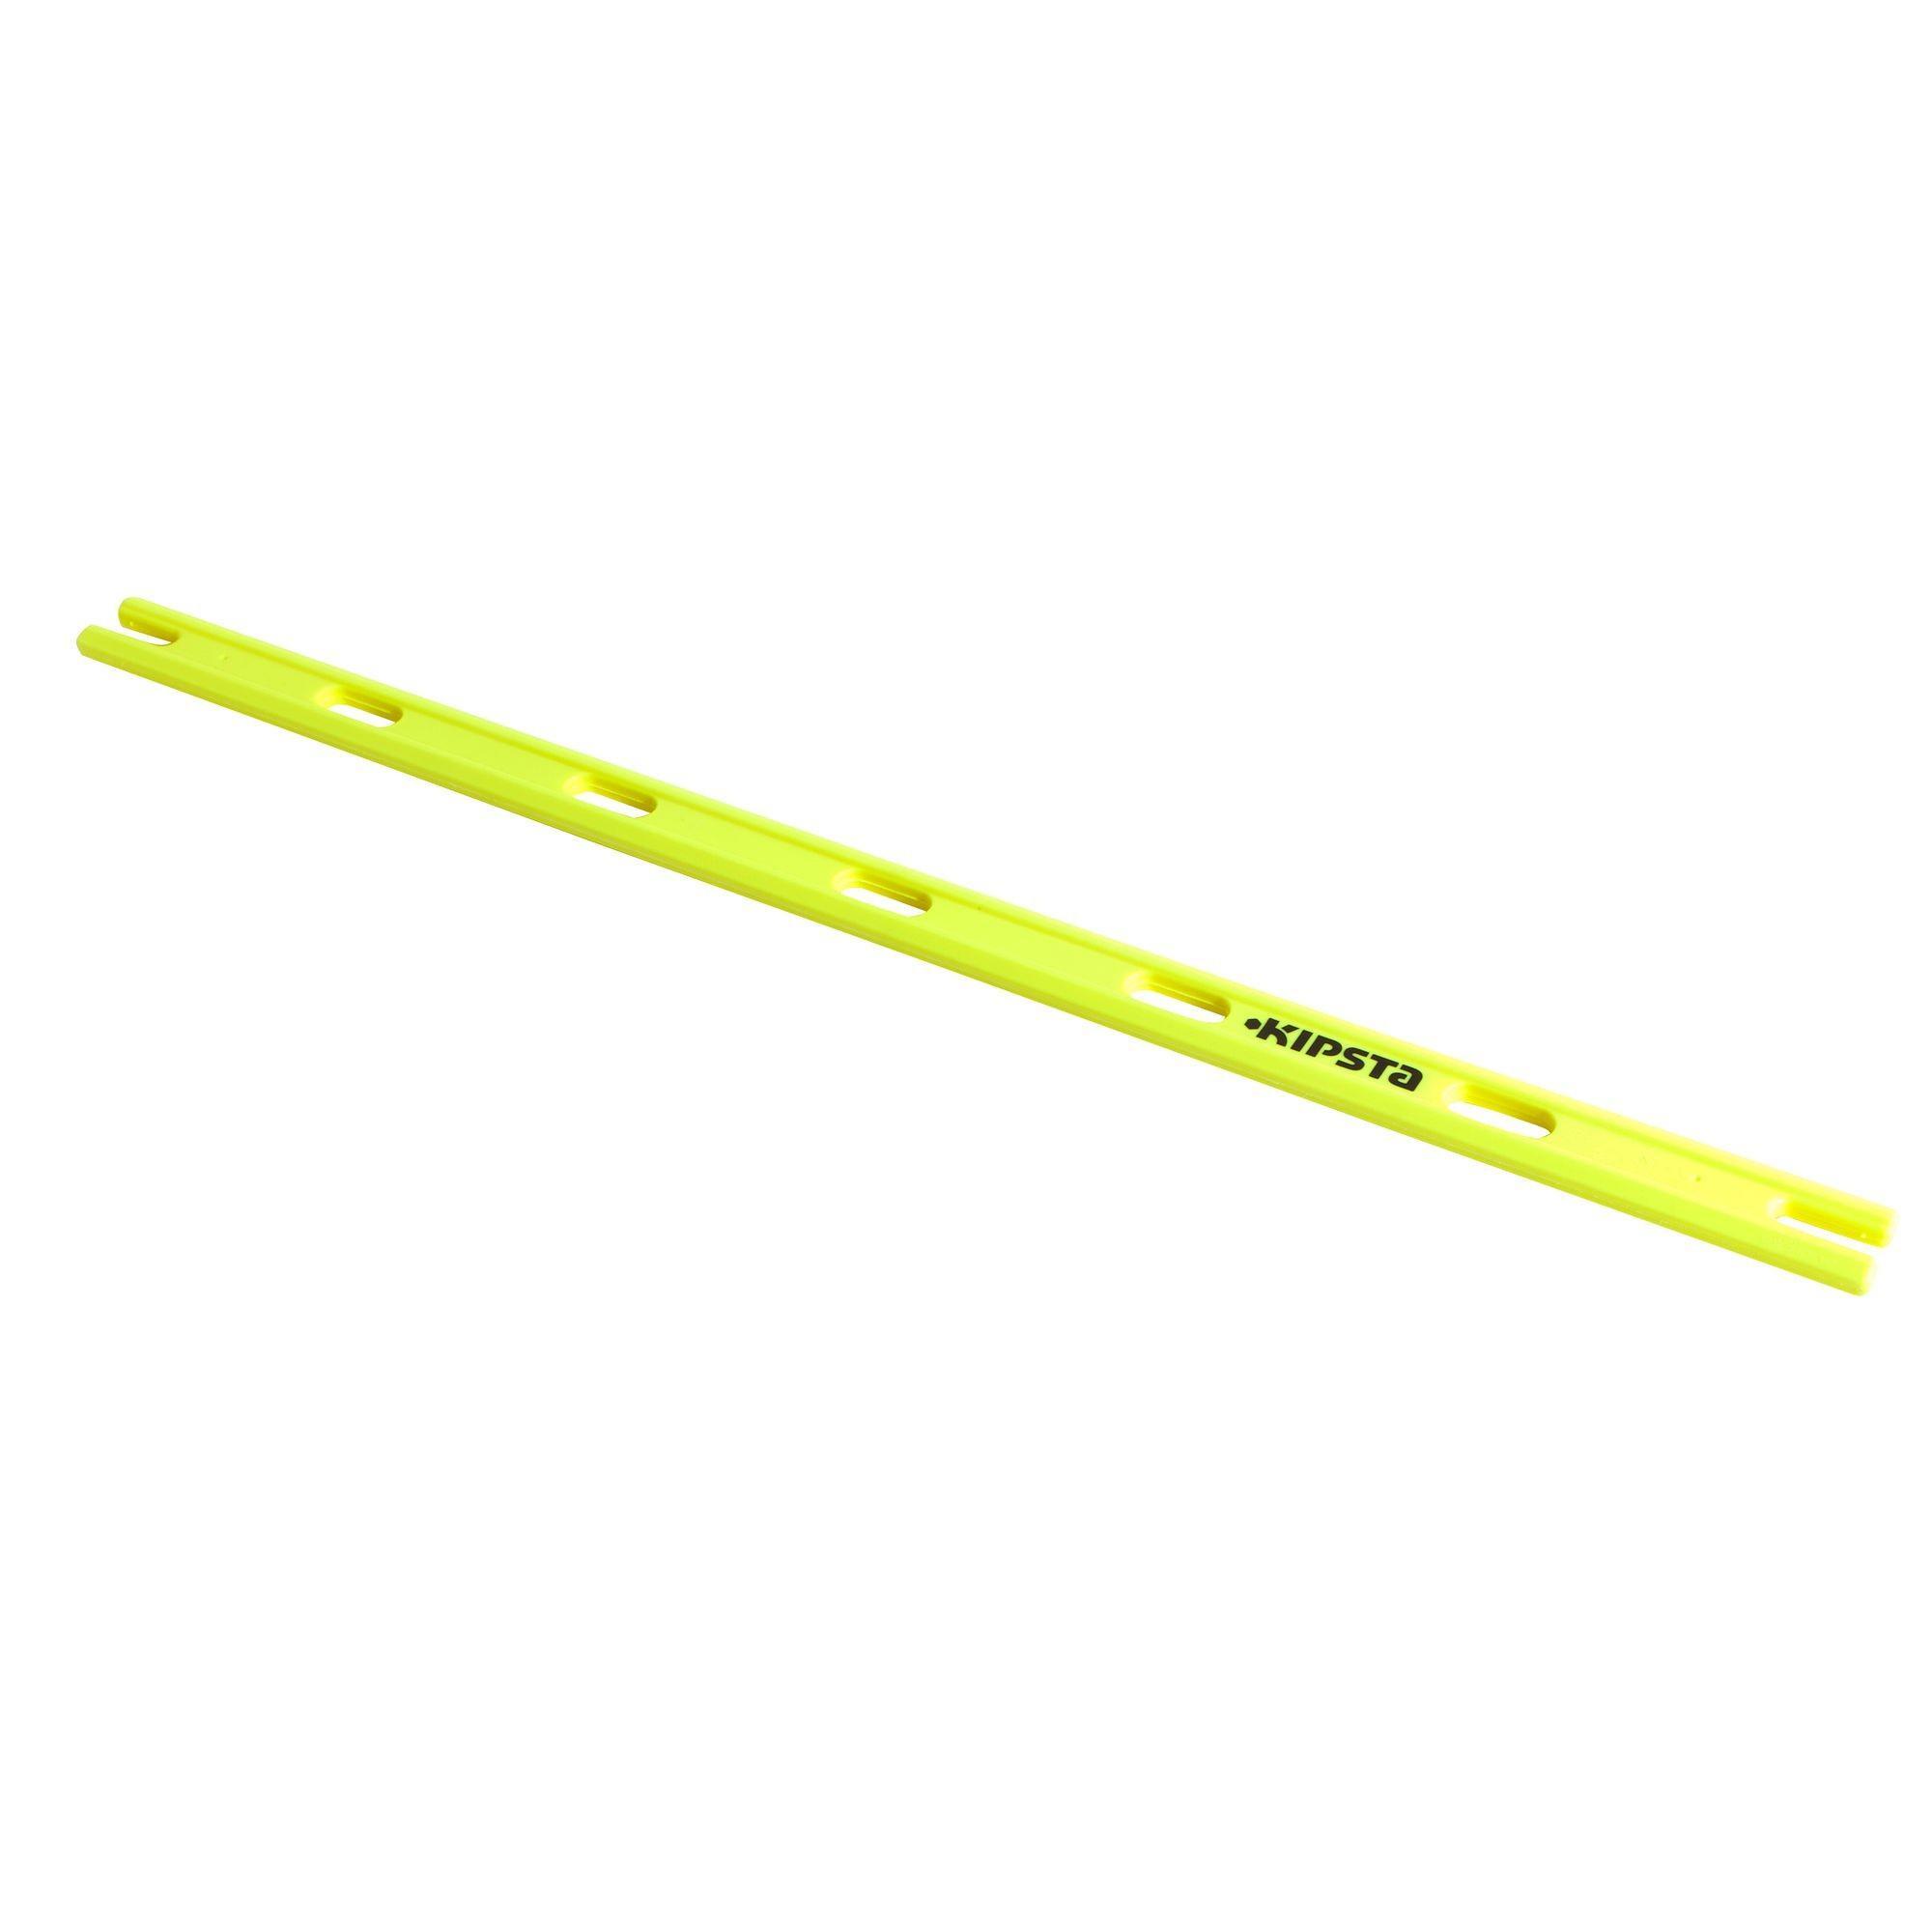 bd0114492044 Lote de 3 marcadores regulables 80 cm amarillo